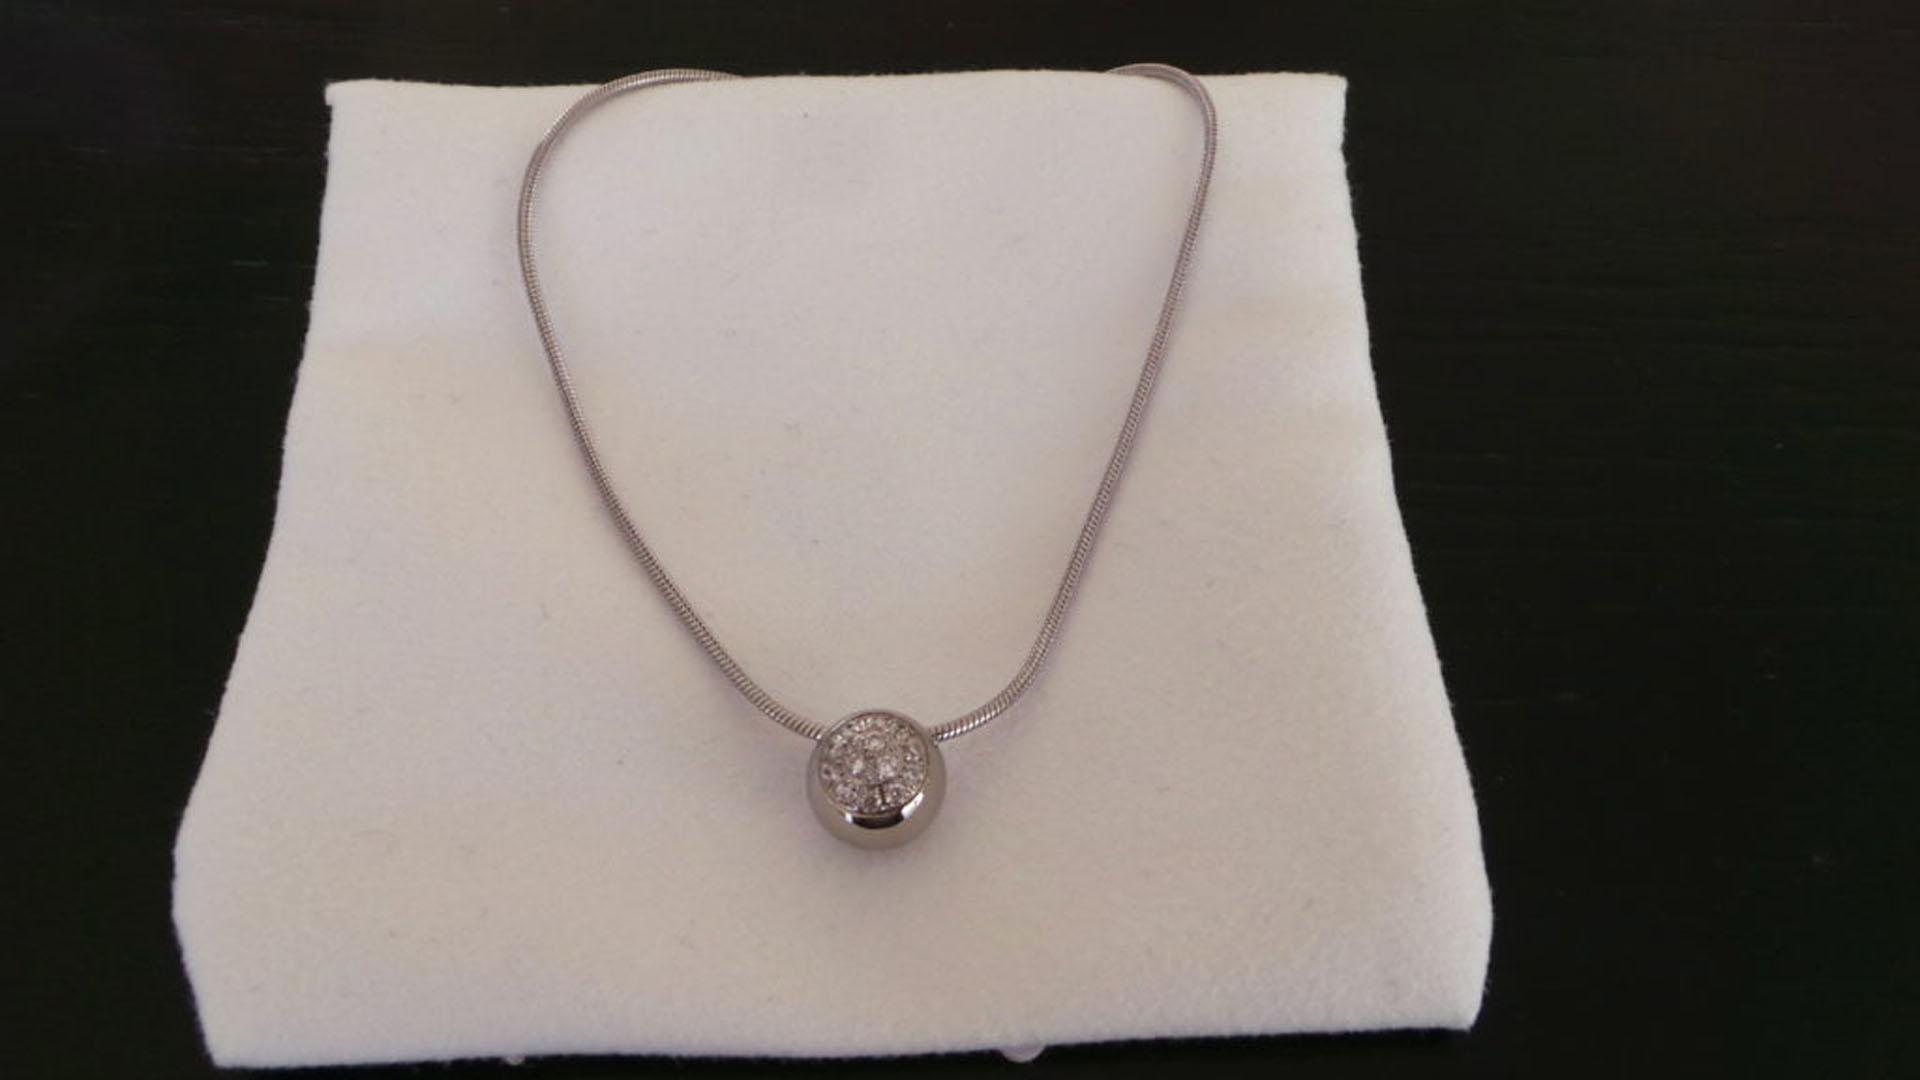 4 e pris ett fint halsband med en glittrande cubic zirkon-klädd kula. ea222d6af2886